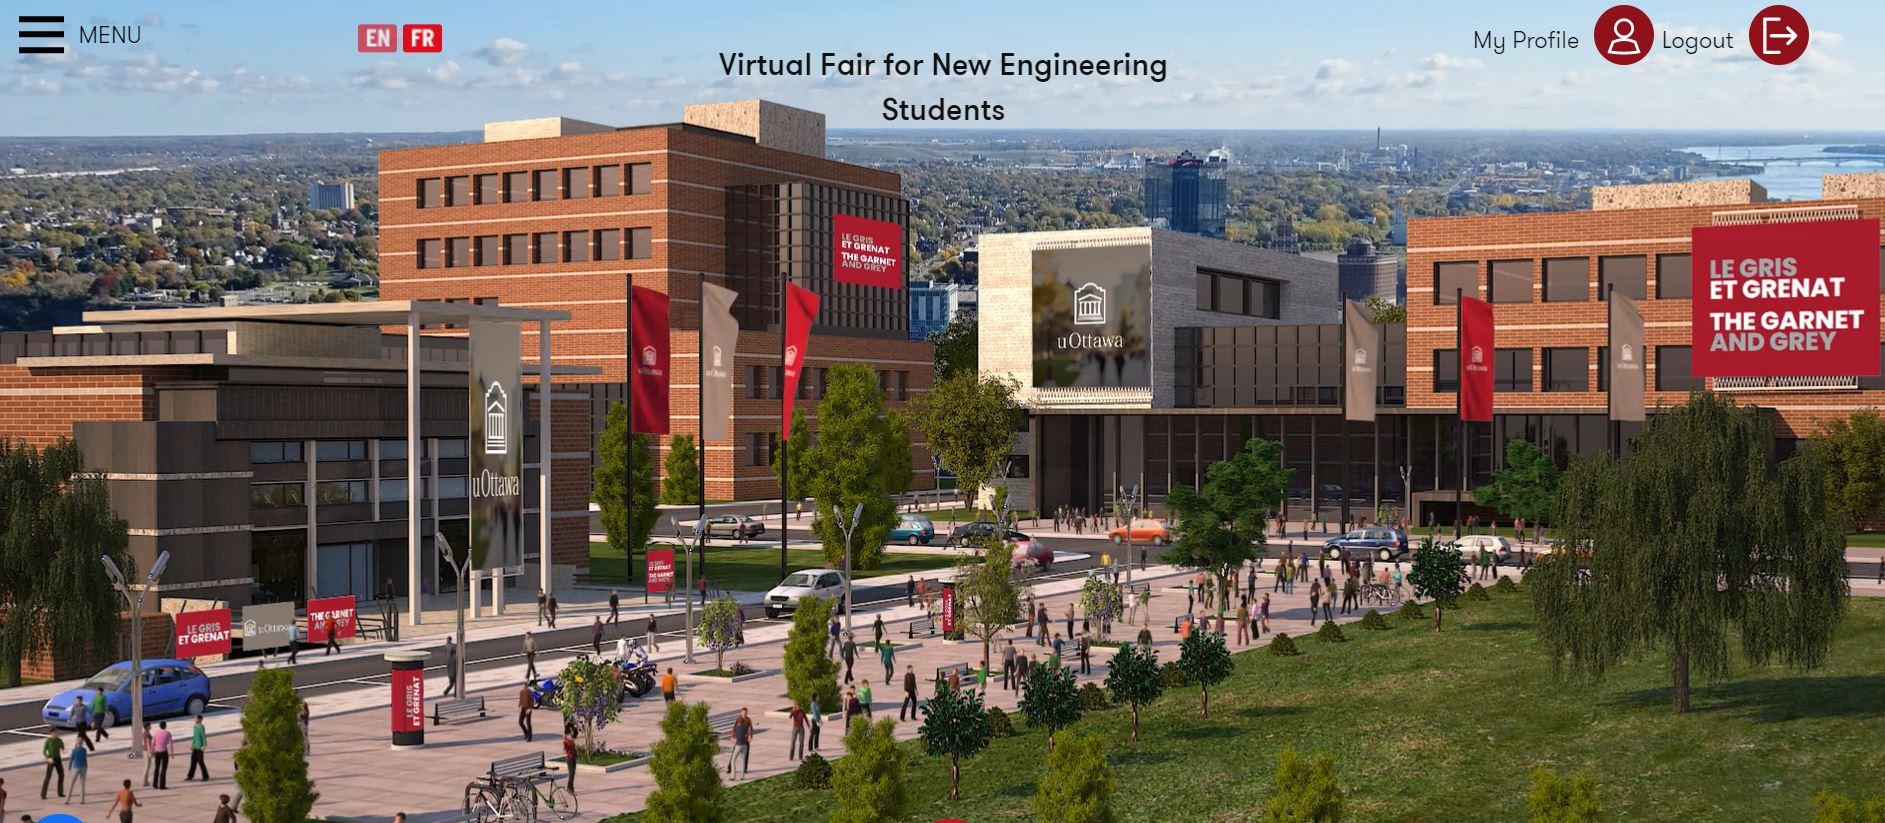 Virtual view of uOttawa campus in the EasyVirtualFair platform